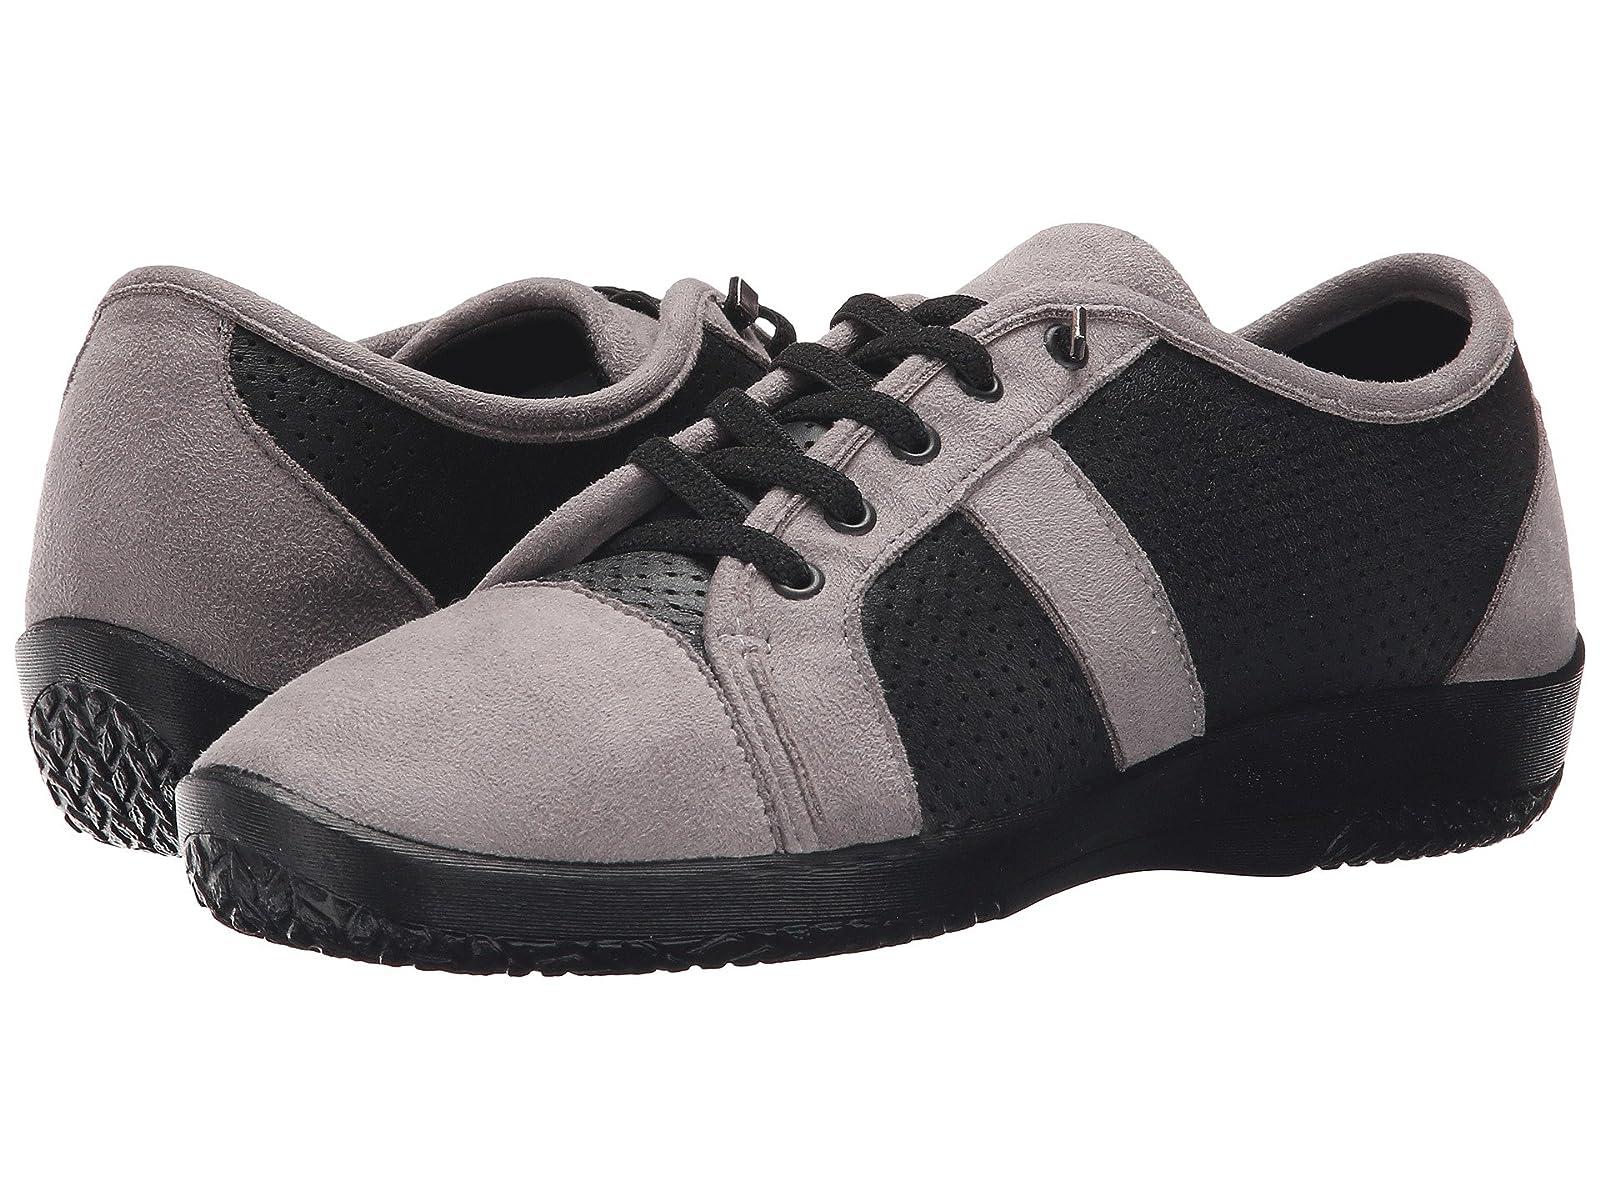 Arcopedico LetaAtmospheric grades have affordable shoes